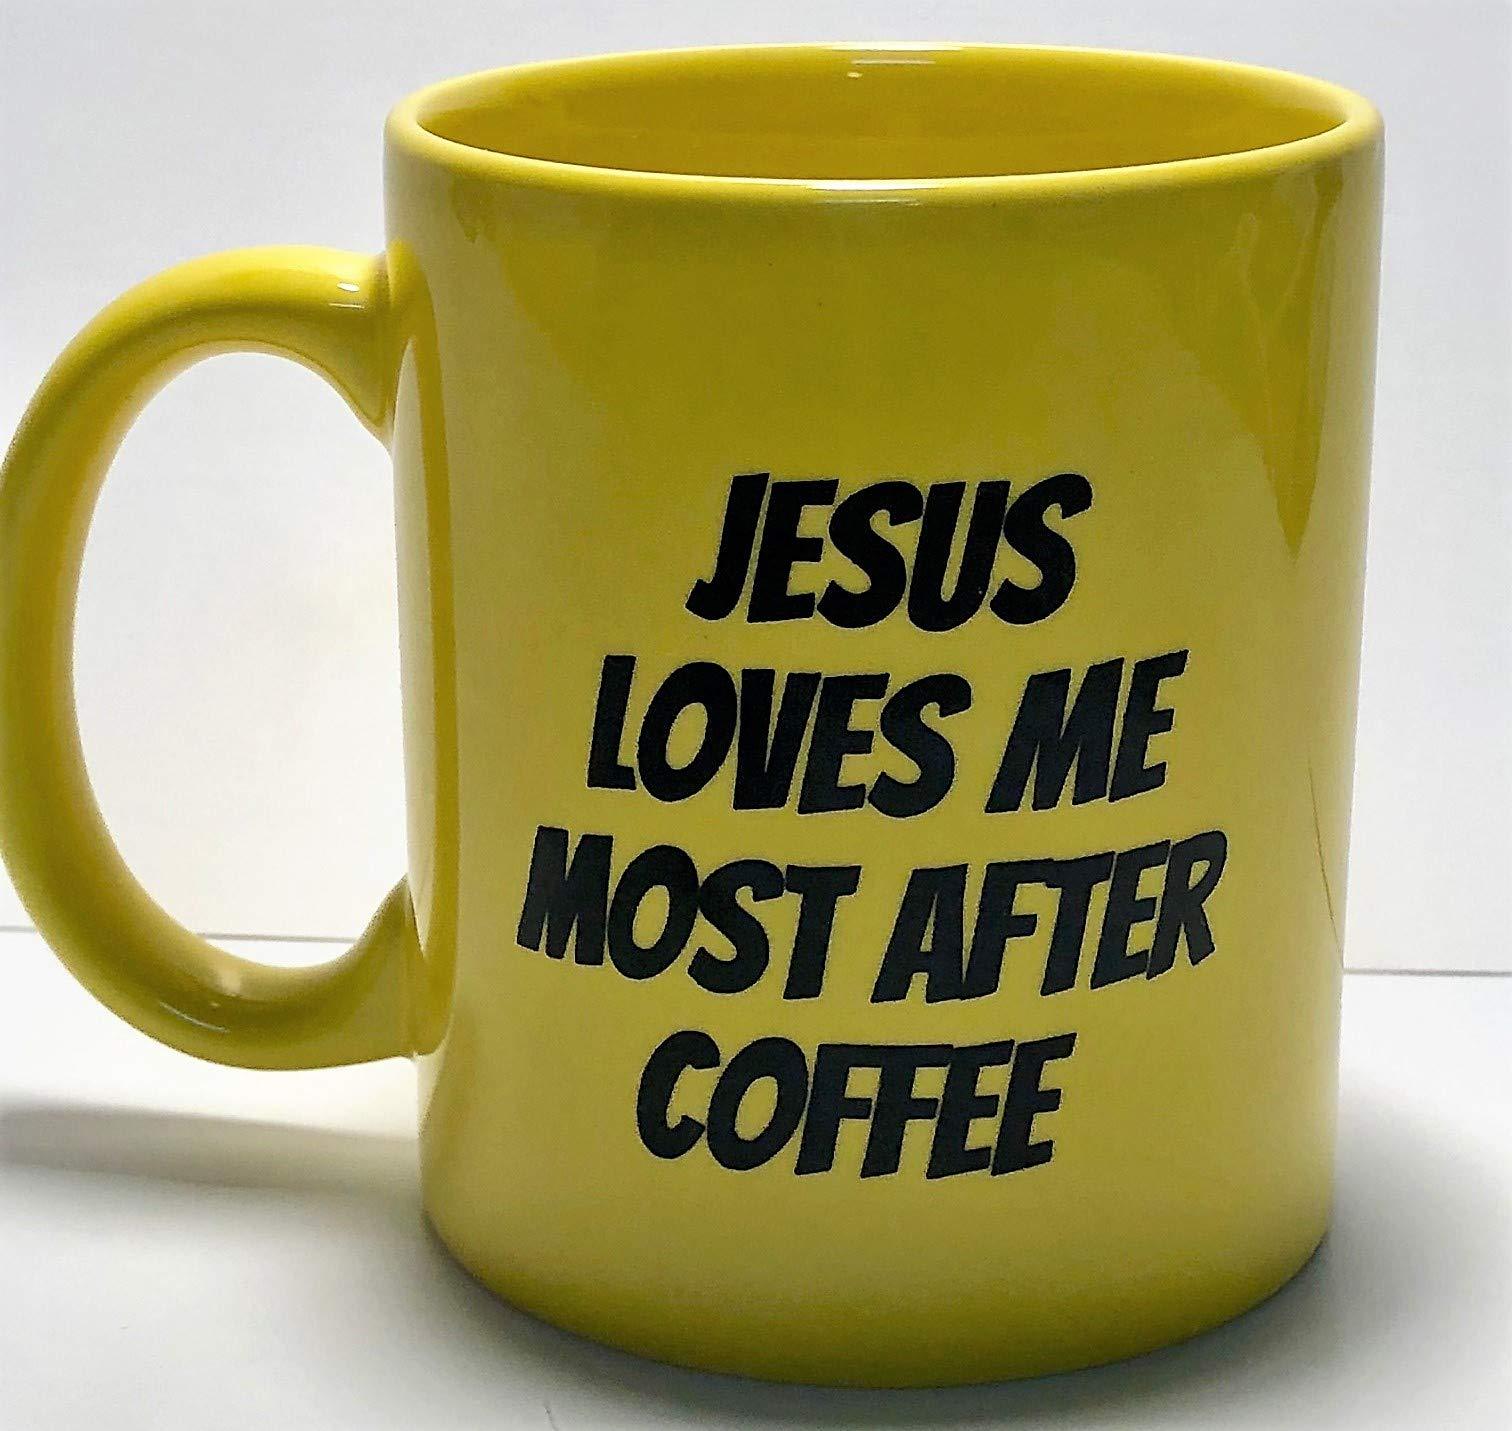 KoppingsKrew Jesus Loves Me Most After Coffee 11oz Mug by Koppingskrew (Image #2)